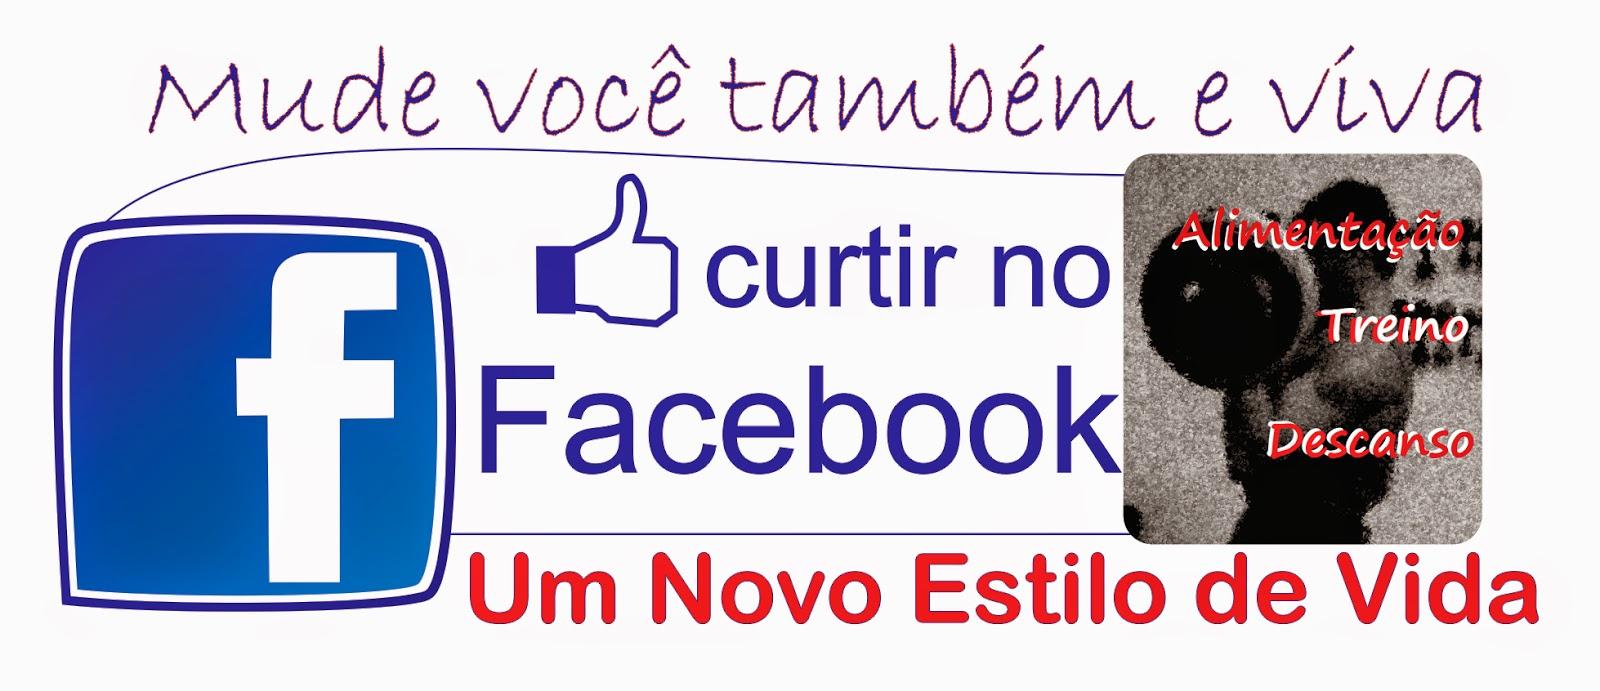 https://www.facebook.com/mudandoestilodevida?ref=bookmarks